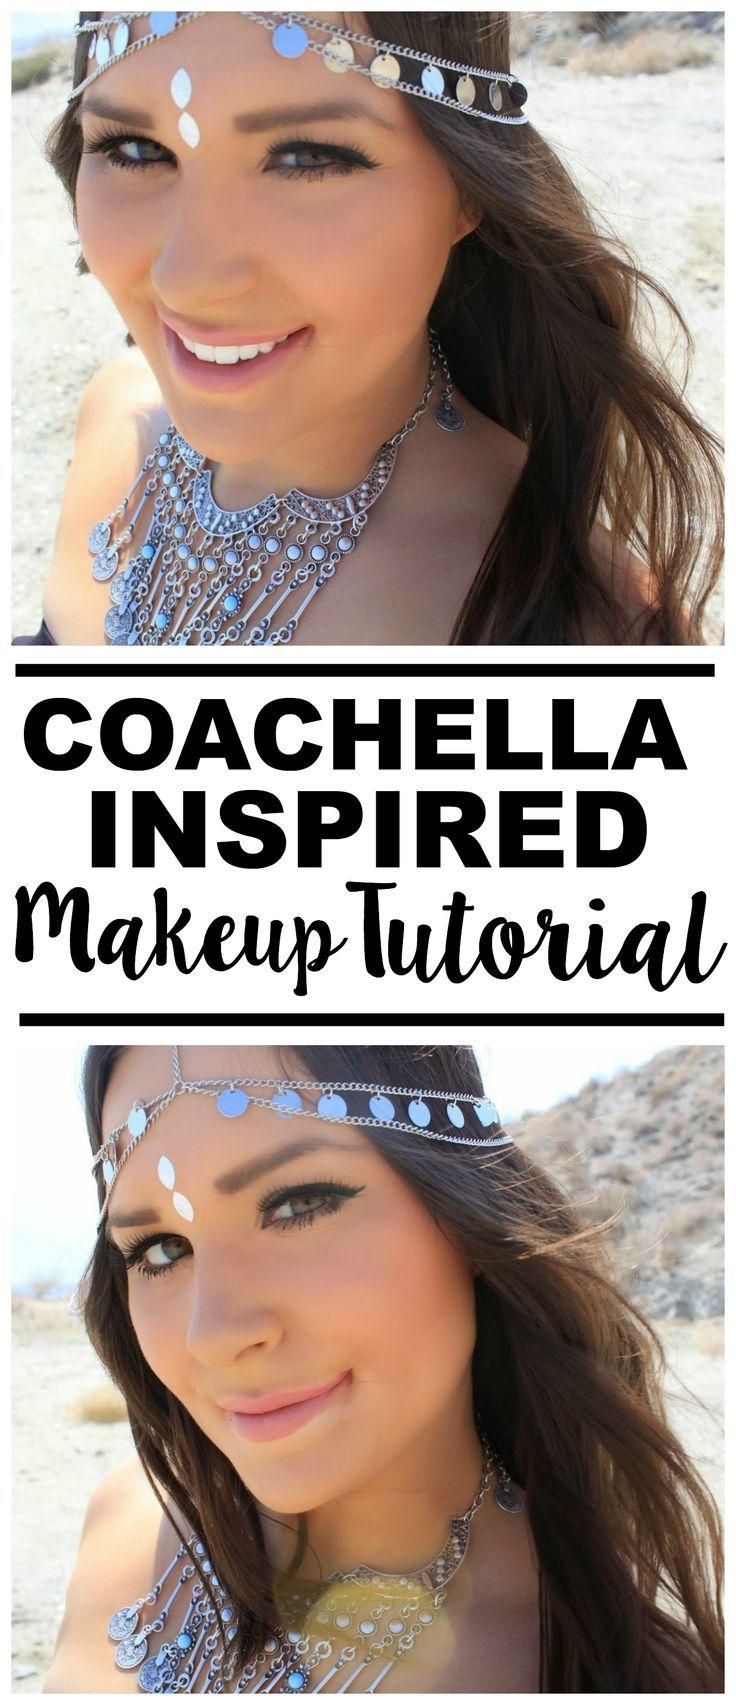 Coachella Inspired Drugstore Makeup Tutorial!